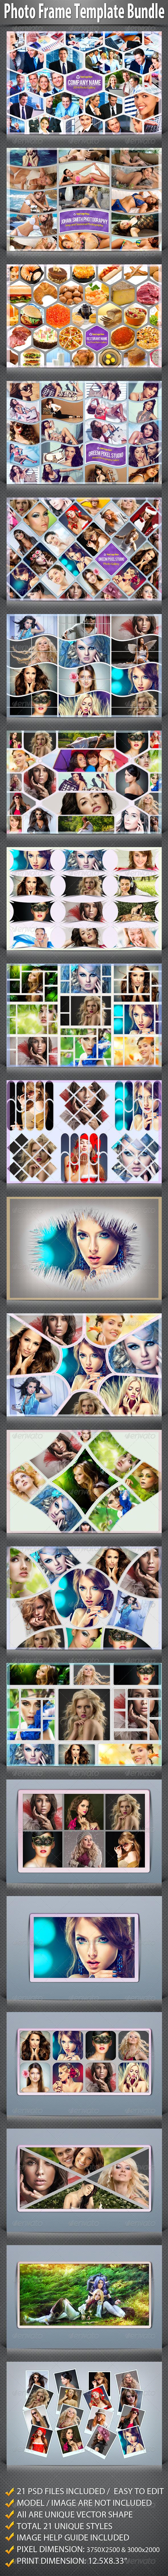 GraphicRiver Photo Frame Templates Bundle 7751267